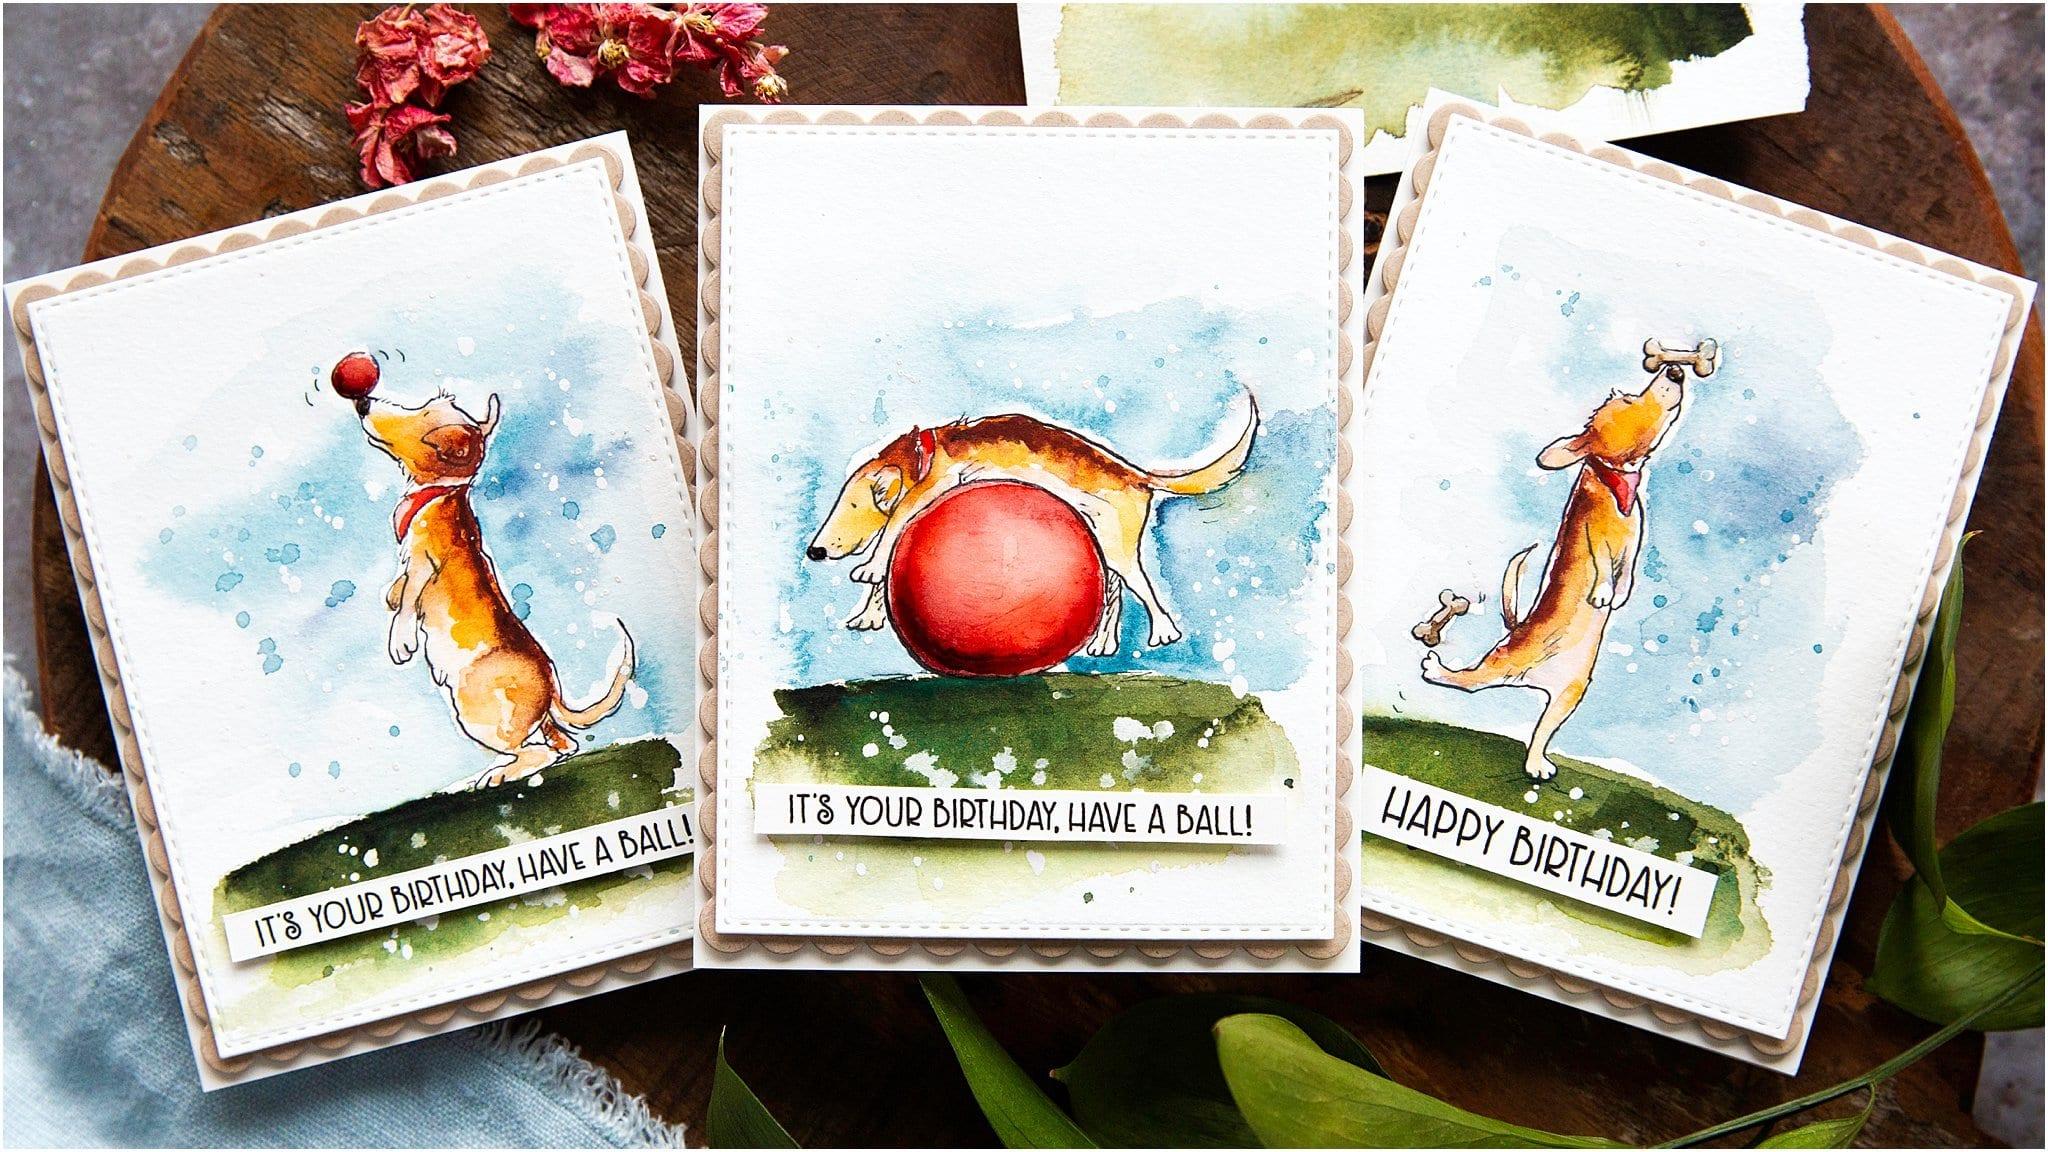 Cute watercoloured handmade card set trio by Debby Hughes using supplies from Colorado Craft Company with Anita Jeram #handmadecards #cardmaking #cardmakingideas #cardmakingtechniques  #cardmakingtutorials #handmadecardideas #coloradocraftcompany #anitajeram